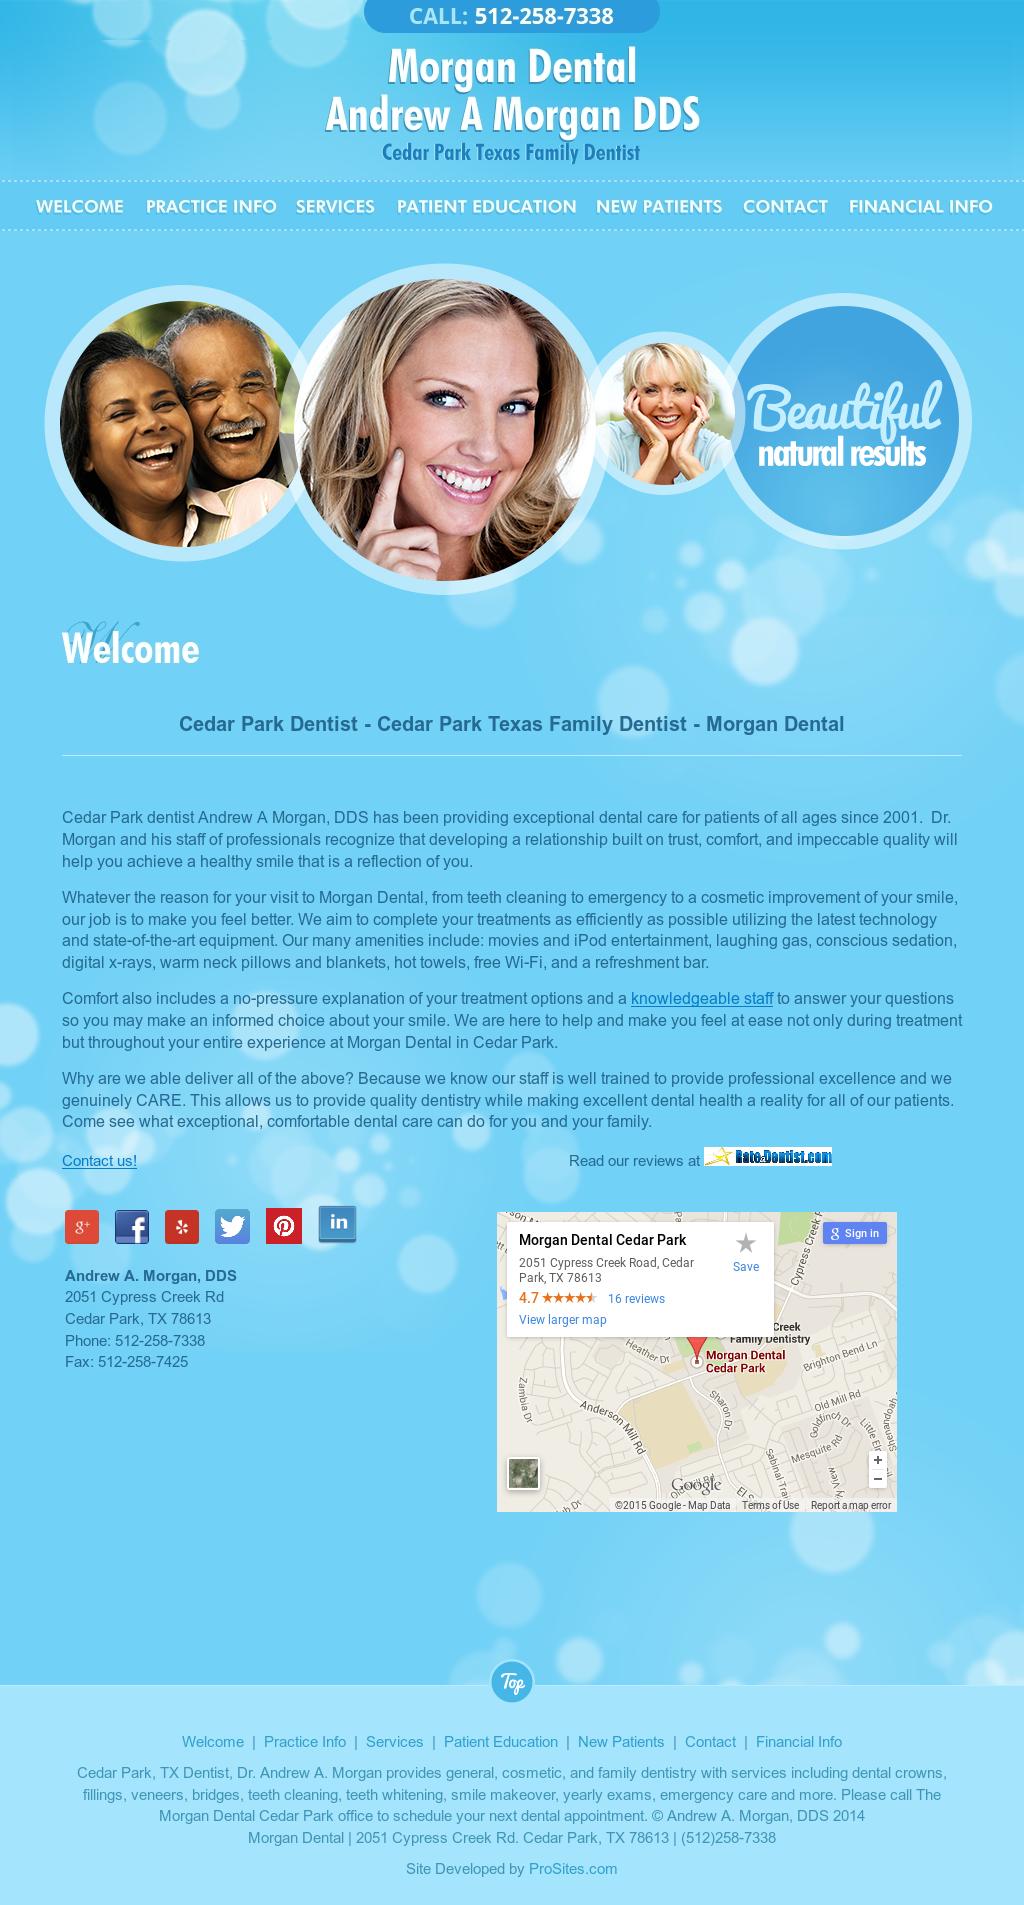 Morgan Dental Competitors, Revenue and Employees - Owler Company Profile